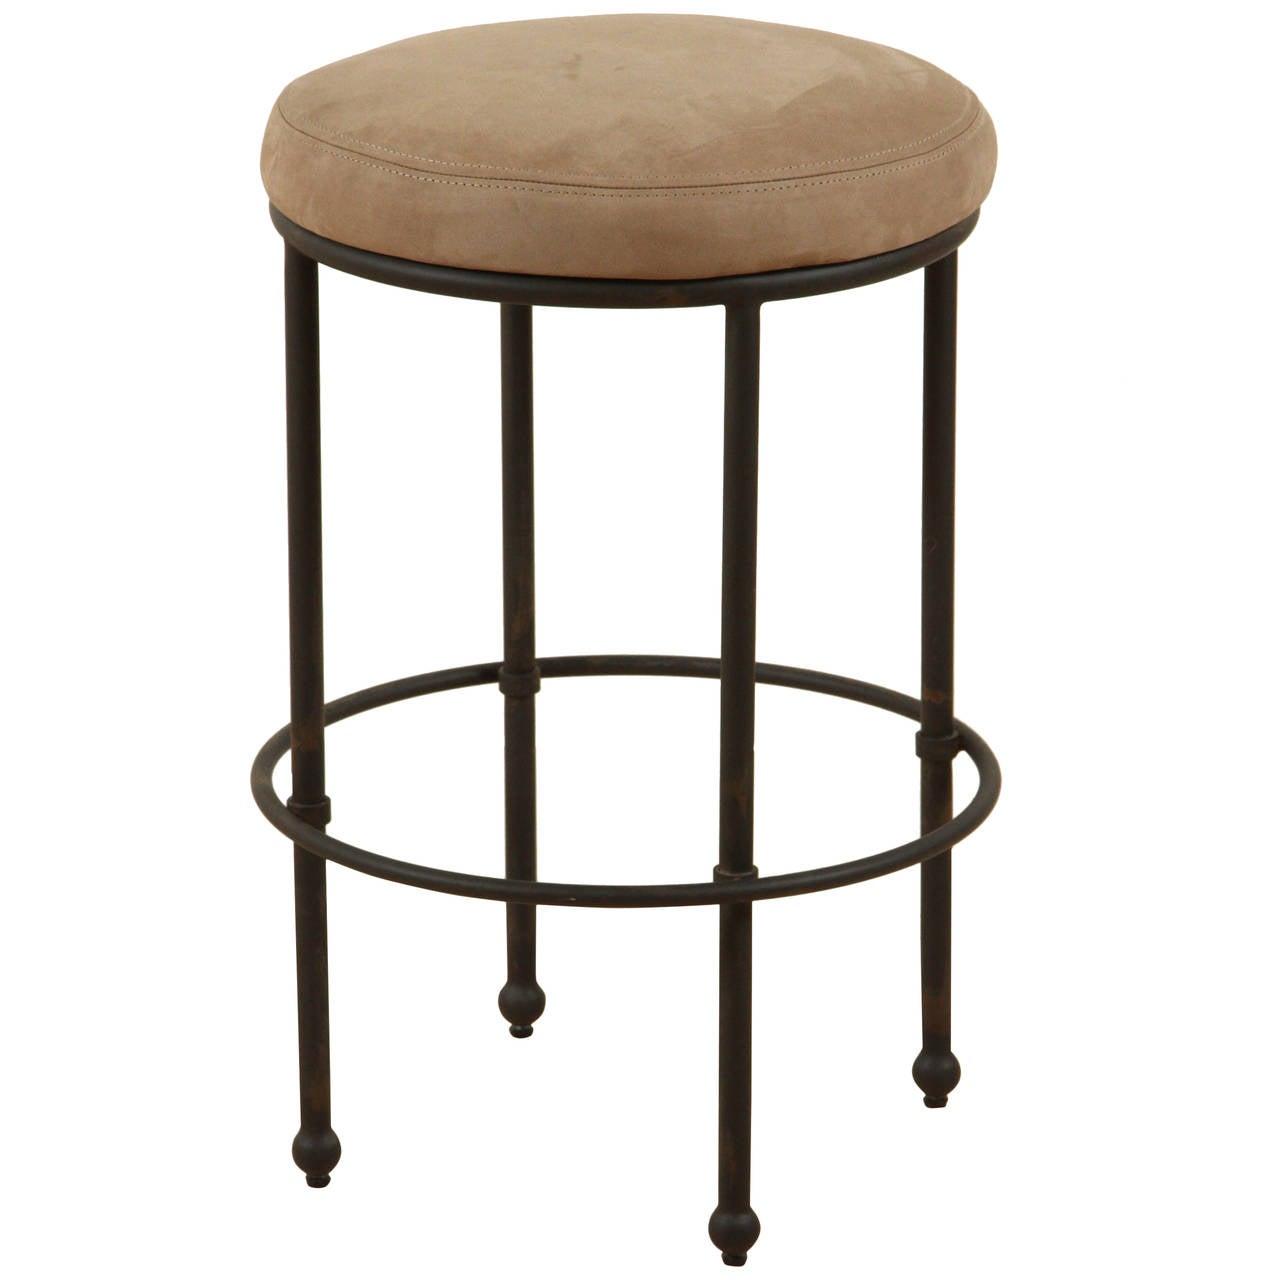 Orsini counter stool, 2015